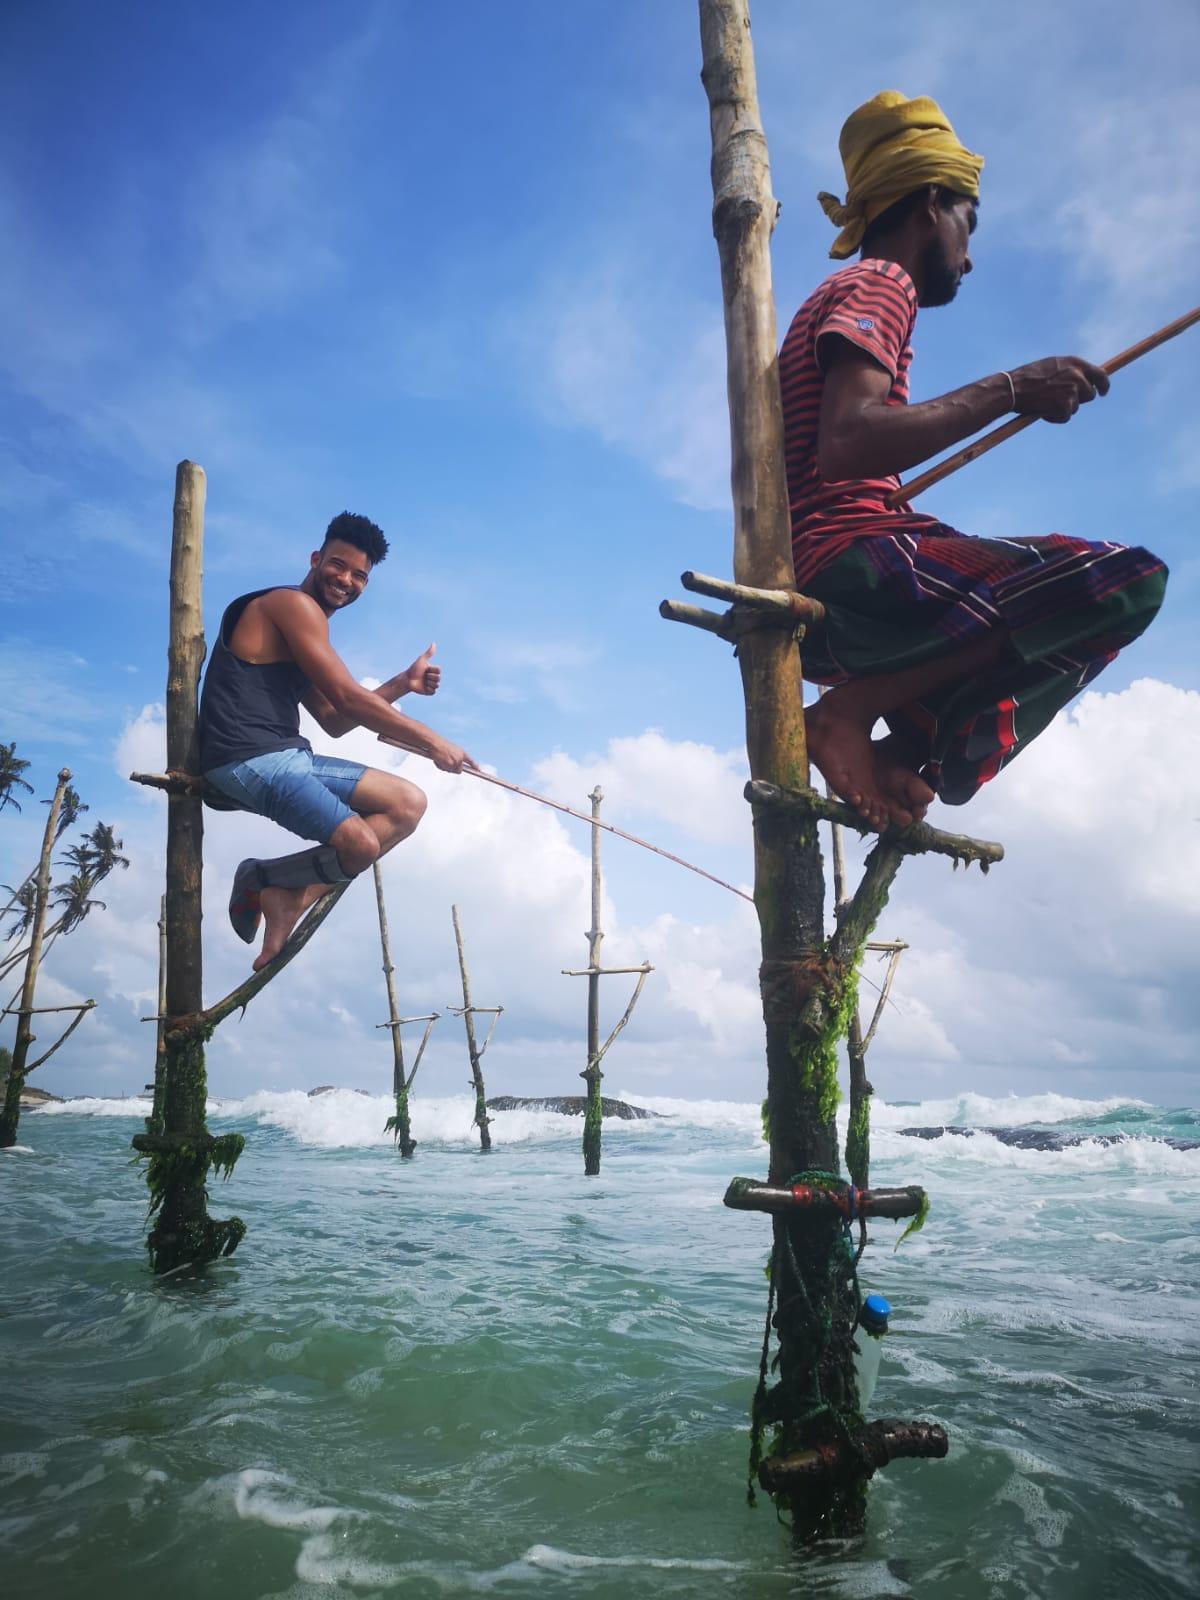 invite-to-paradise-sri-lanka-holiday-honeymoon-specialists-customer-feedback-elin-jordan-luce-stilt-fishing-try-2.JPG